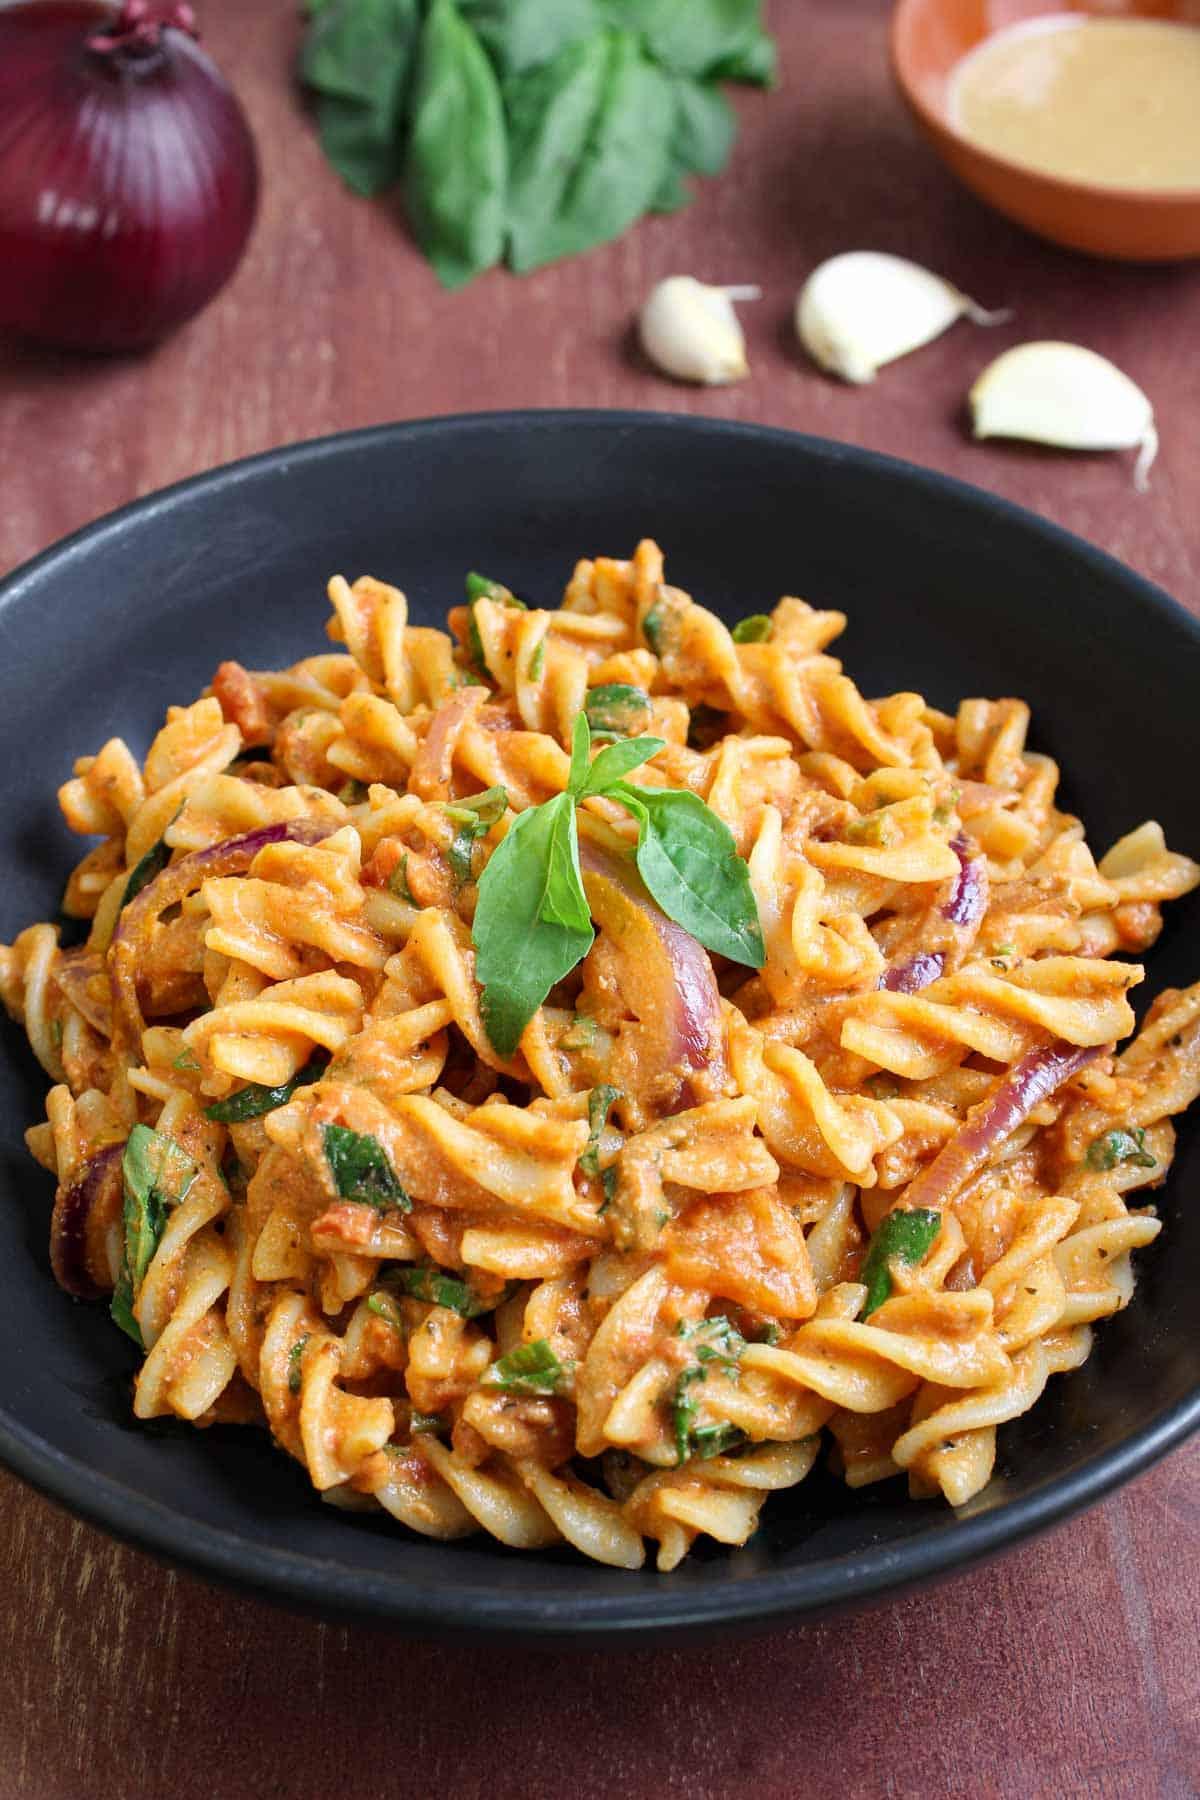 Creamy Tahini Pasta with Tomatoes and Basil